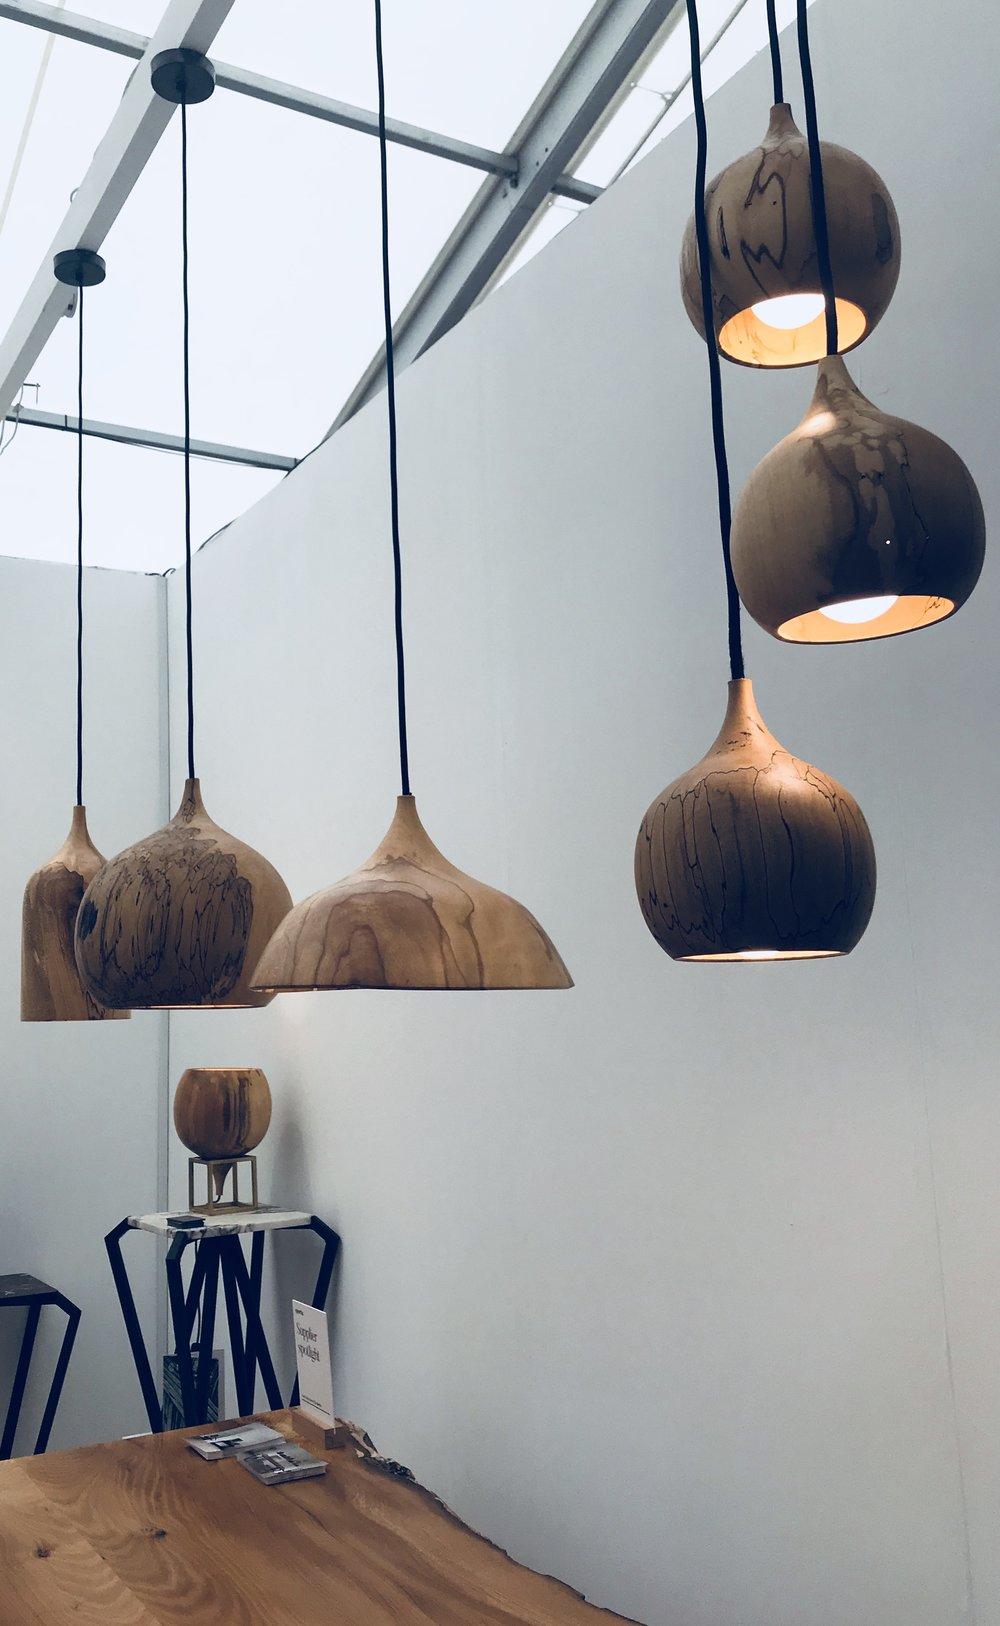 tamasine-osher-wooden-lights-decorex-lauraloves-design.jpg